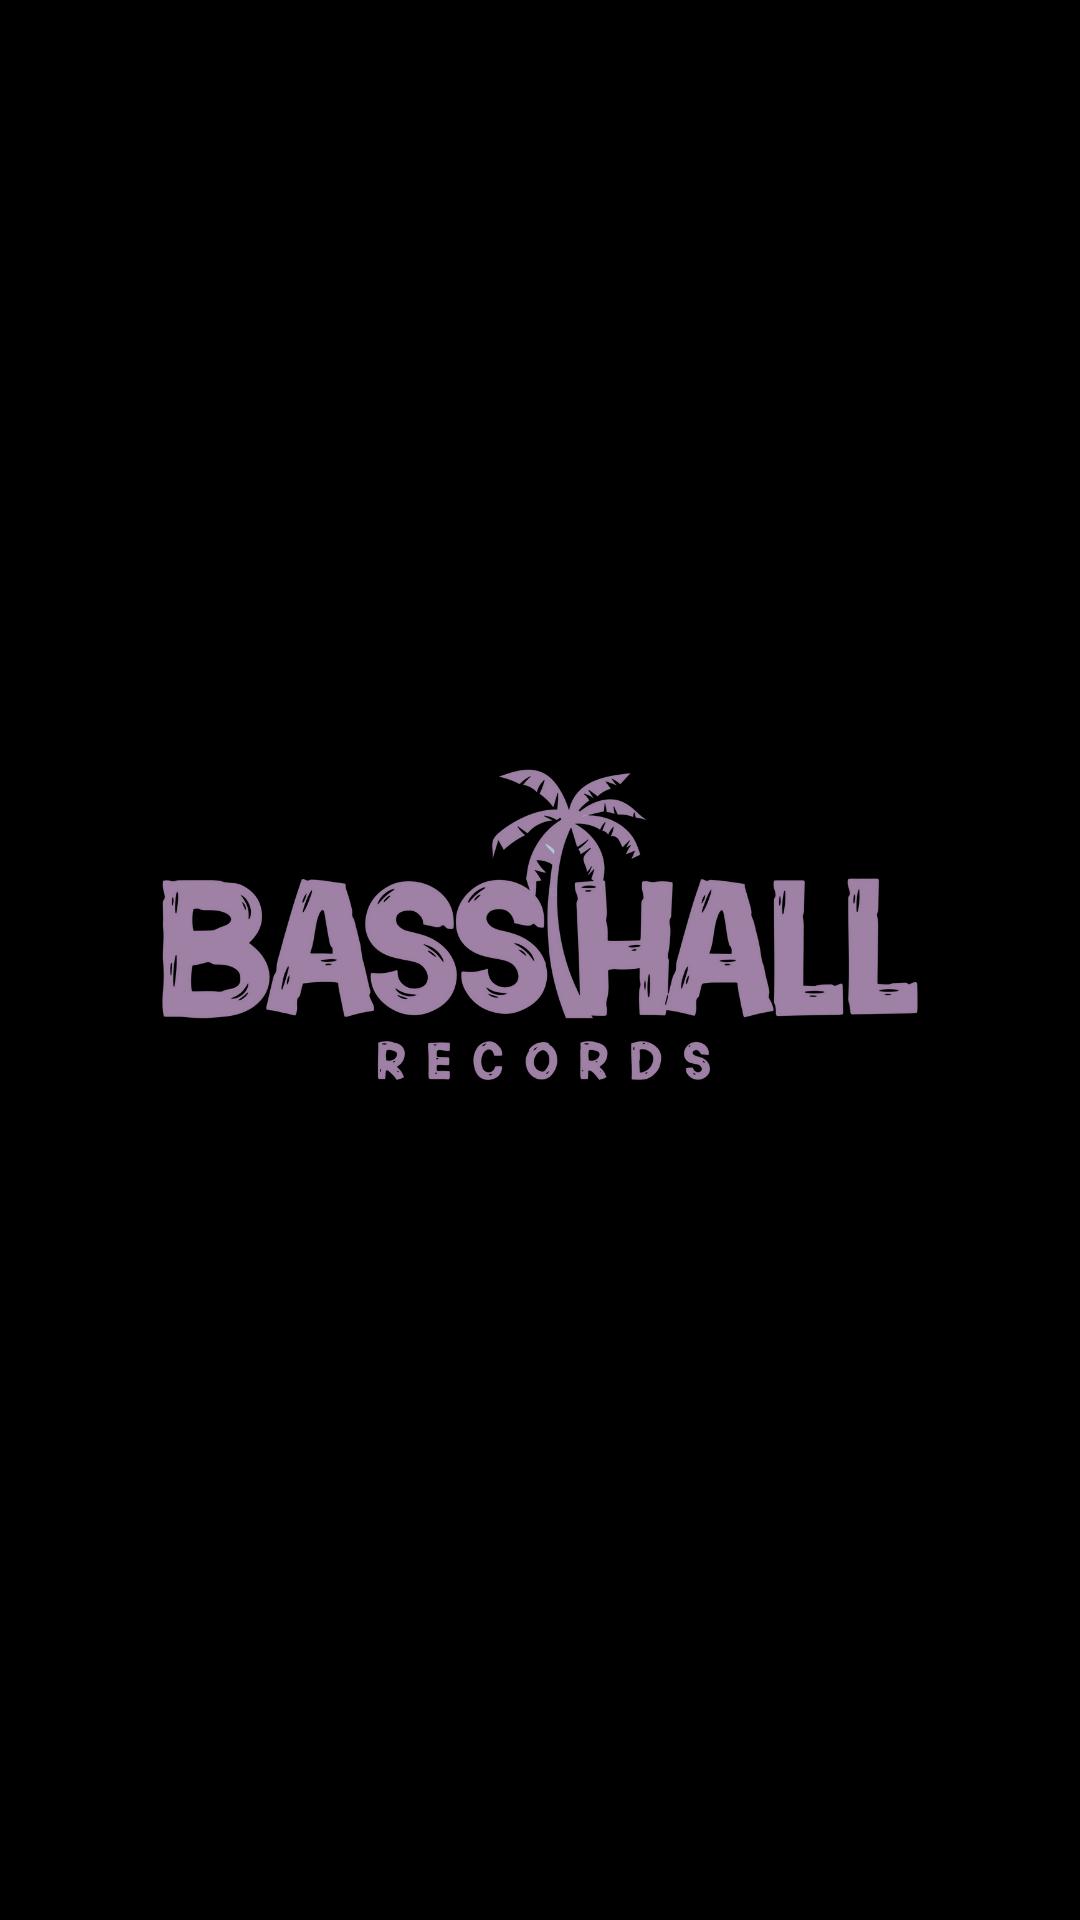 Bass Hall Records